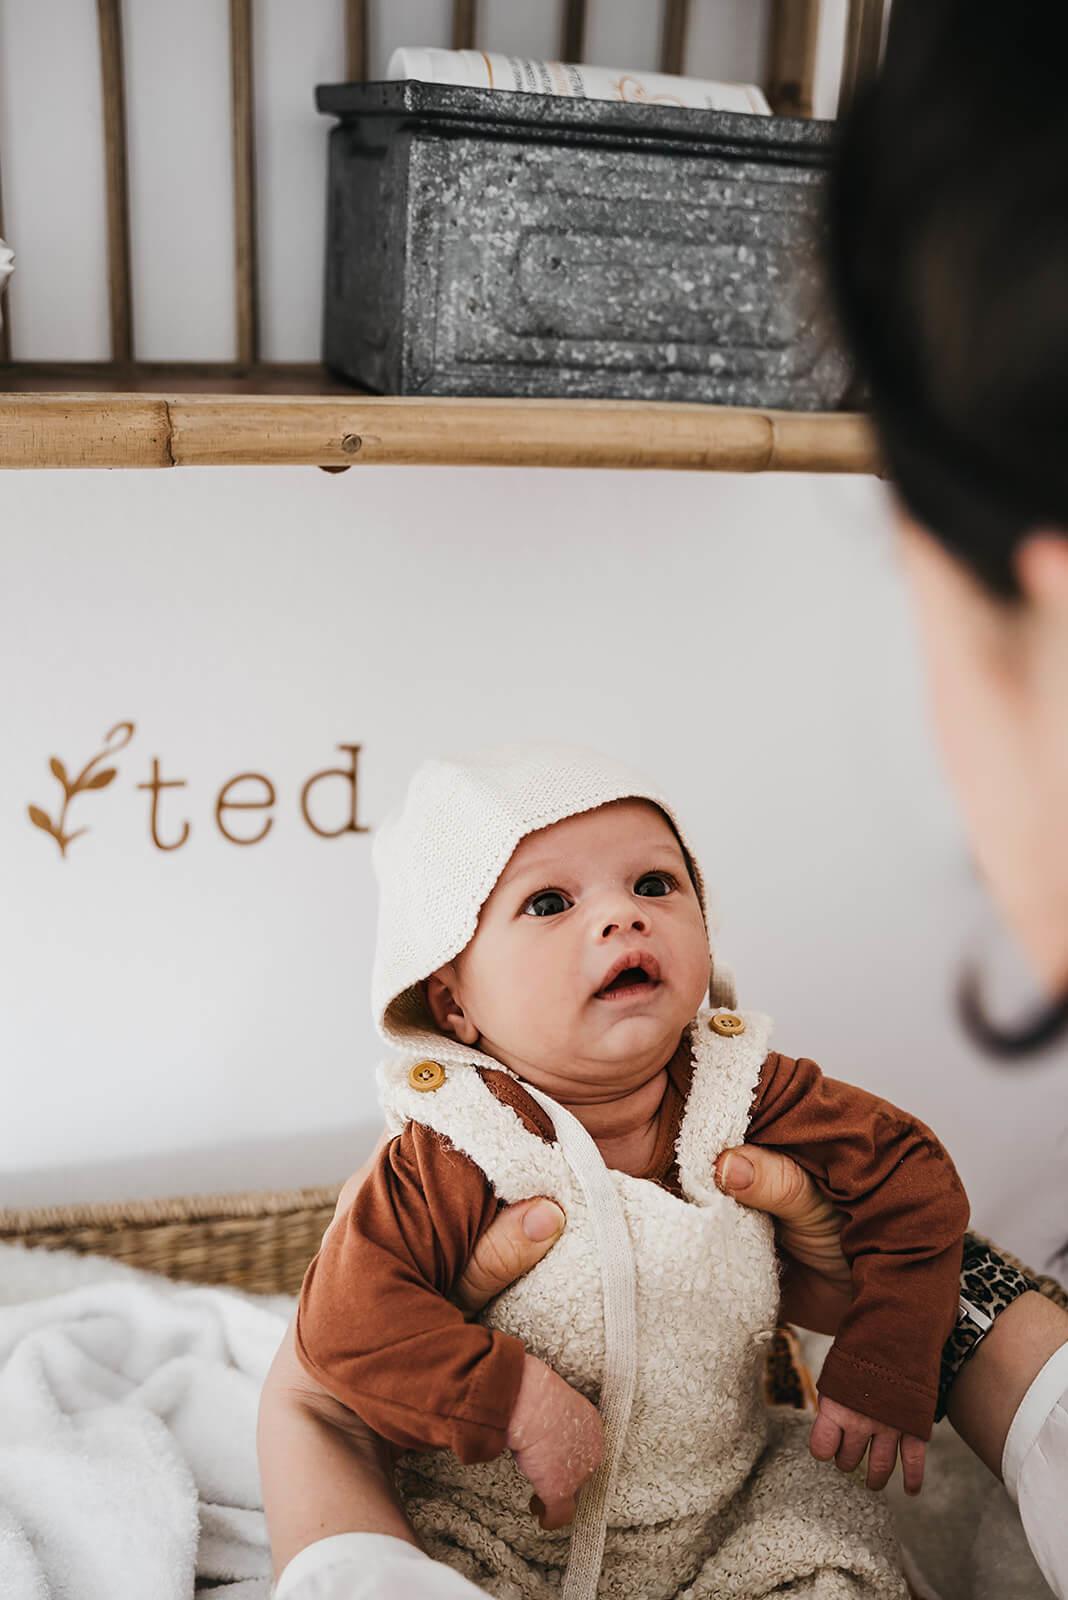 Naamsticker Ted